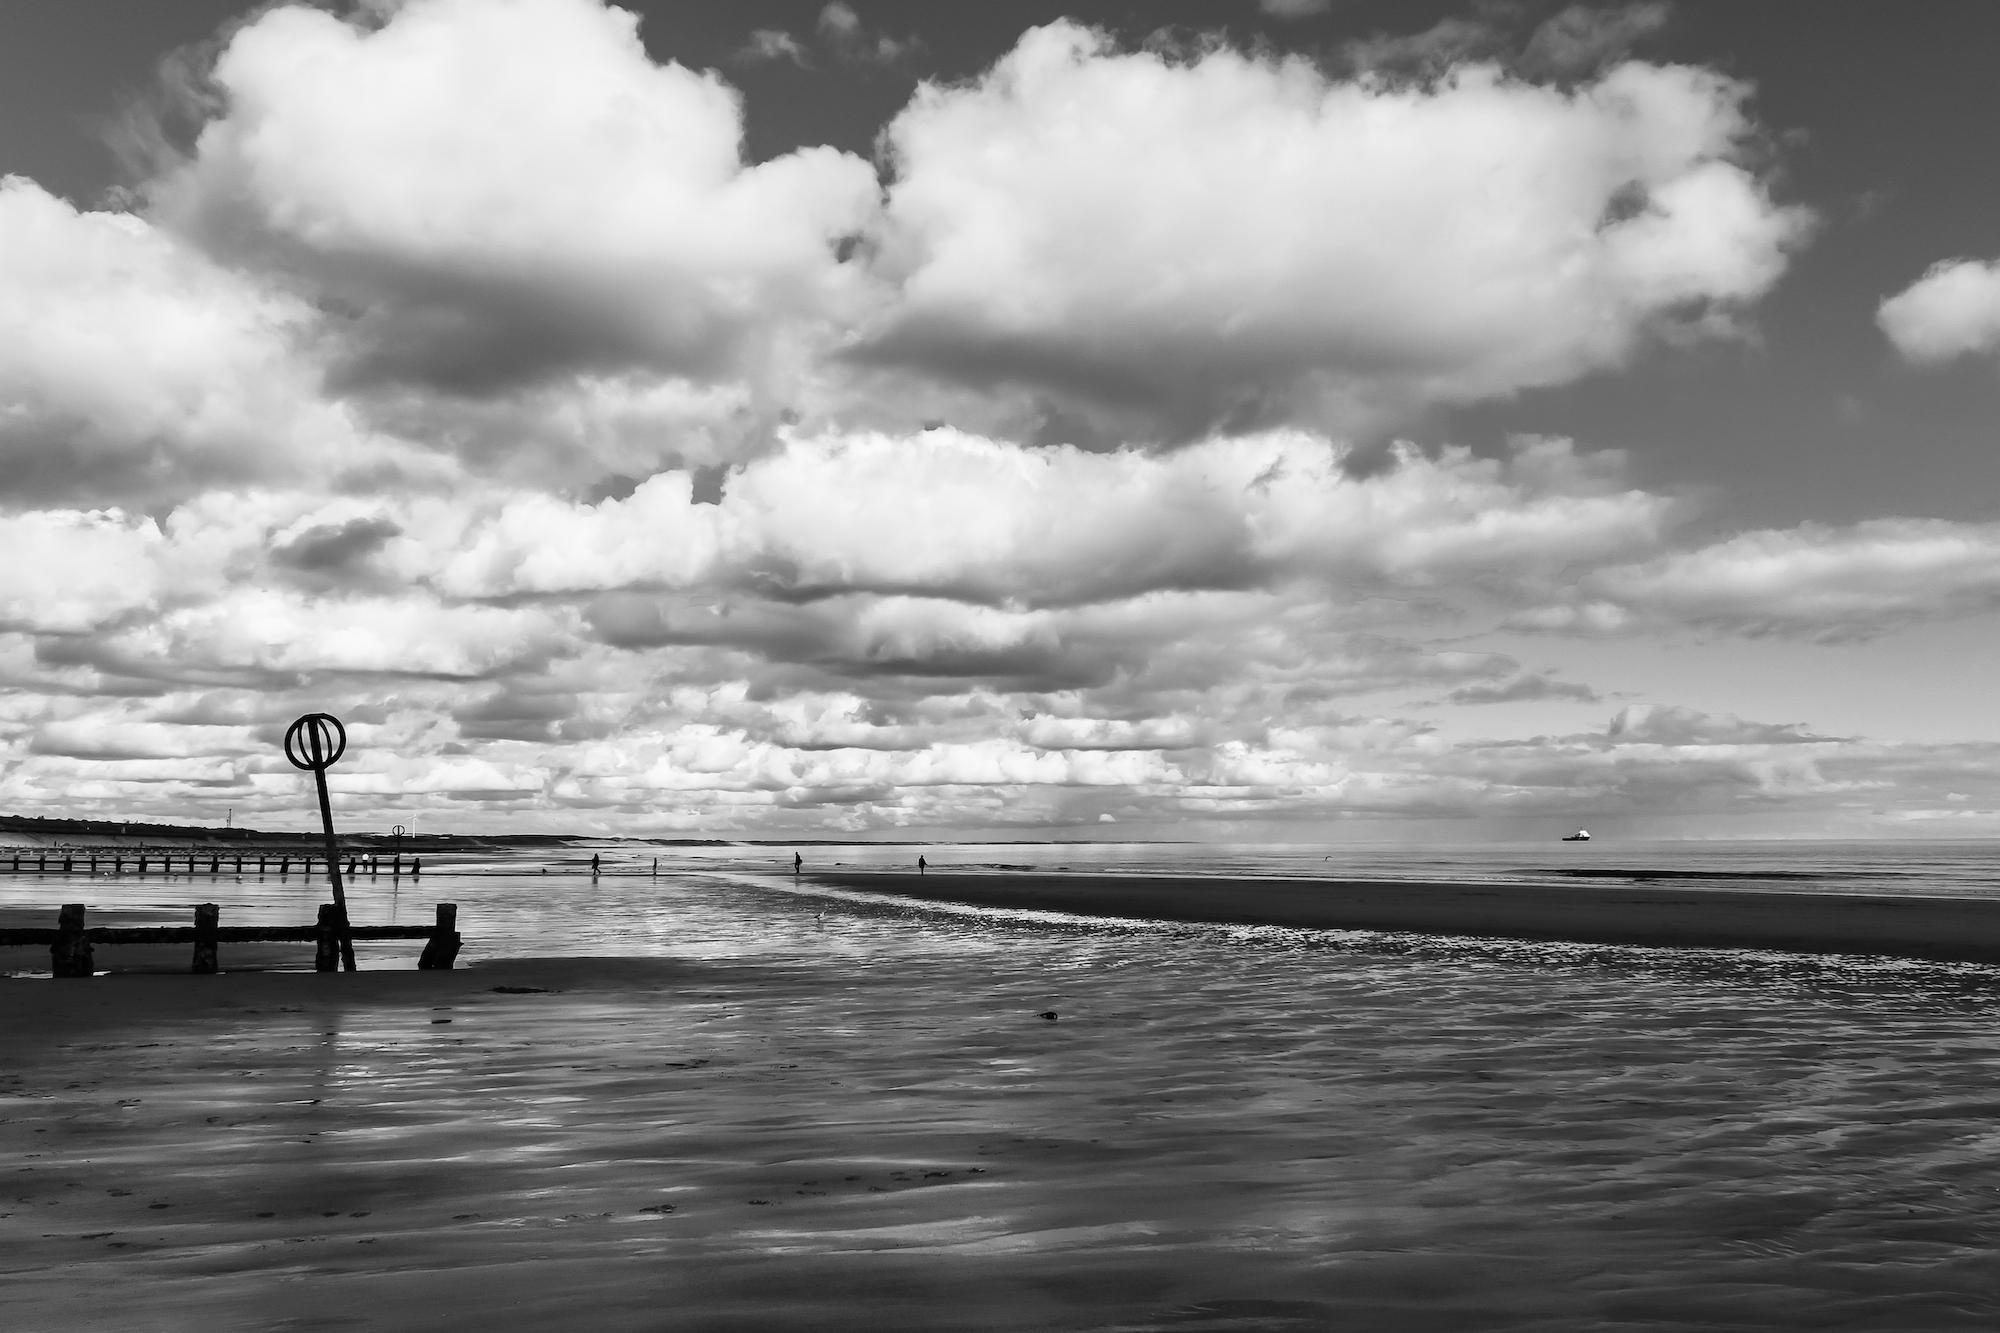 (184) The beach, Esplanade, Aberdeen Bay, Aberdeen, Scotland. Copyright David Wheater.jpg